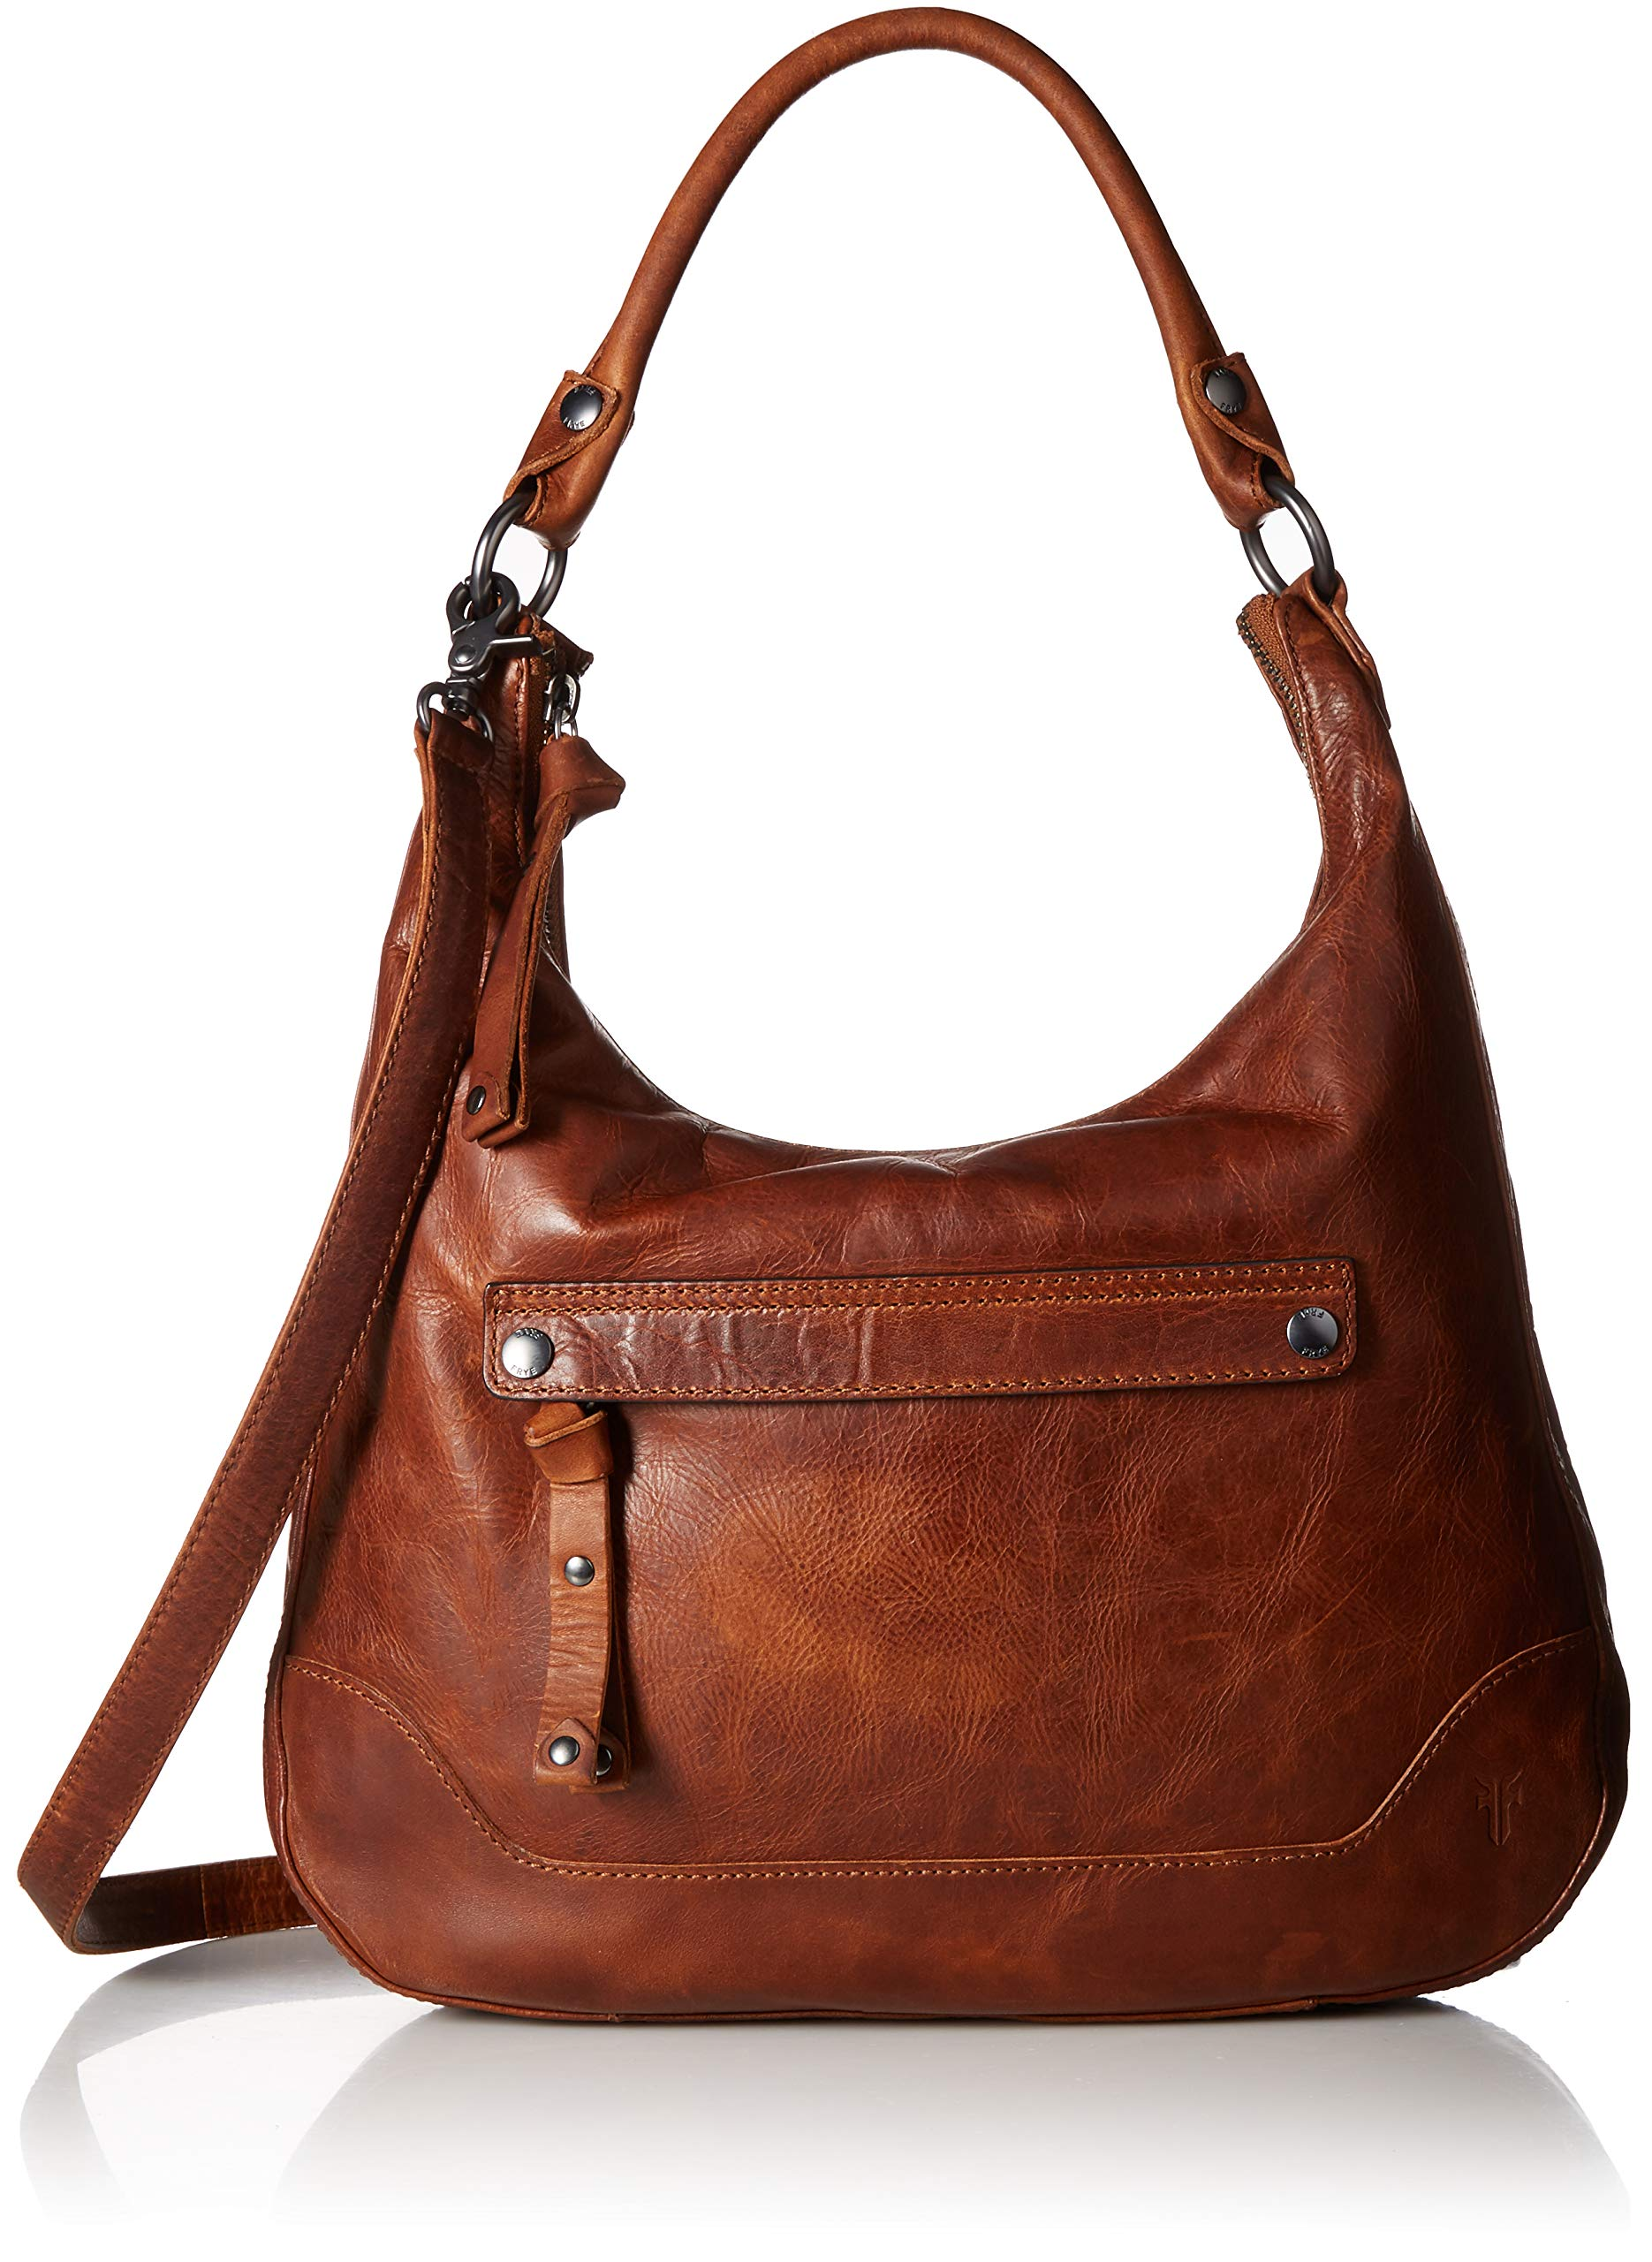 FRYE Melissa Zip Leather Hobo Handbag, cognac